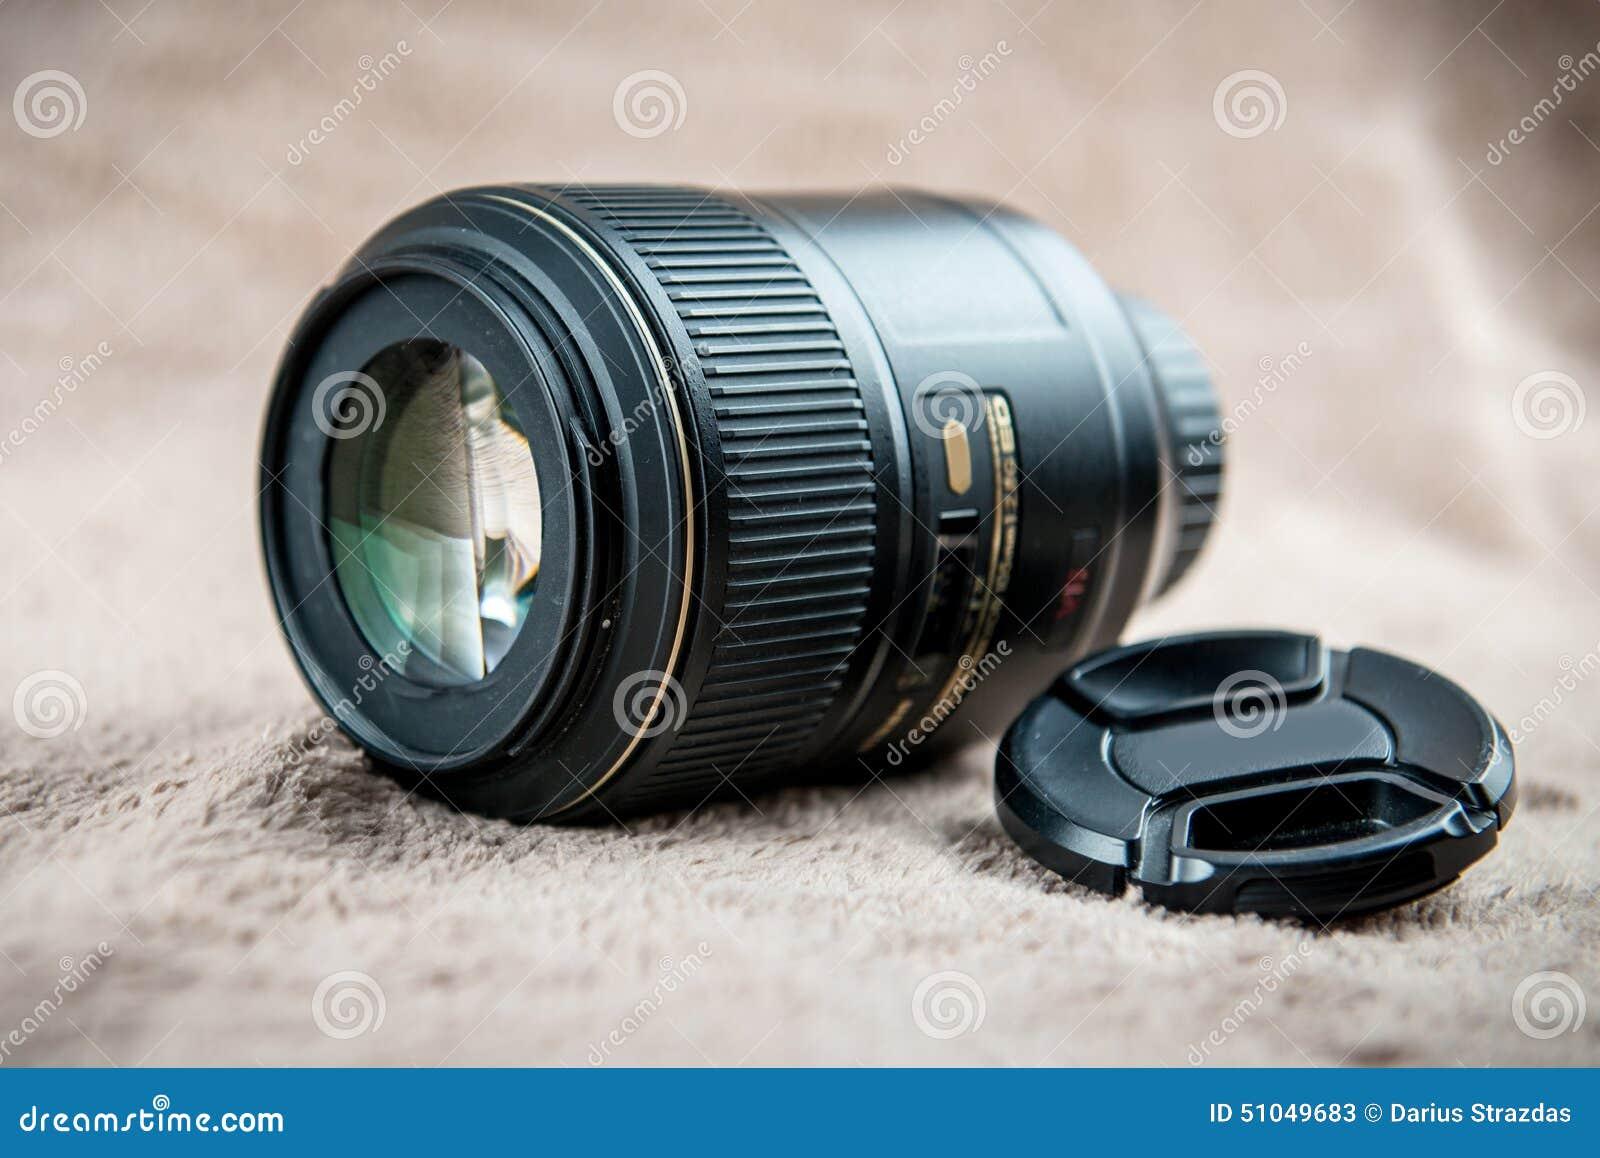 Photo lens front